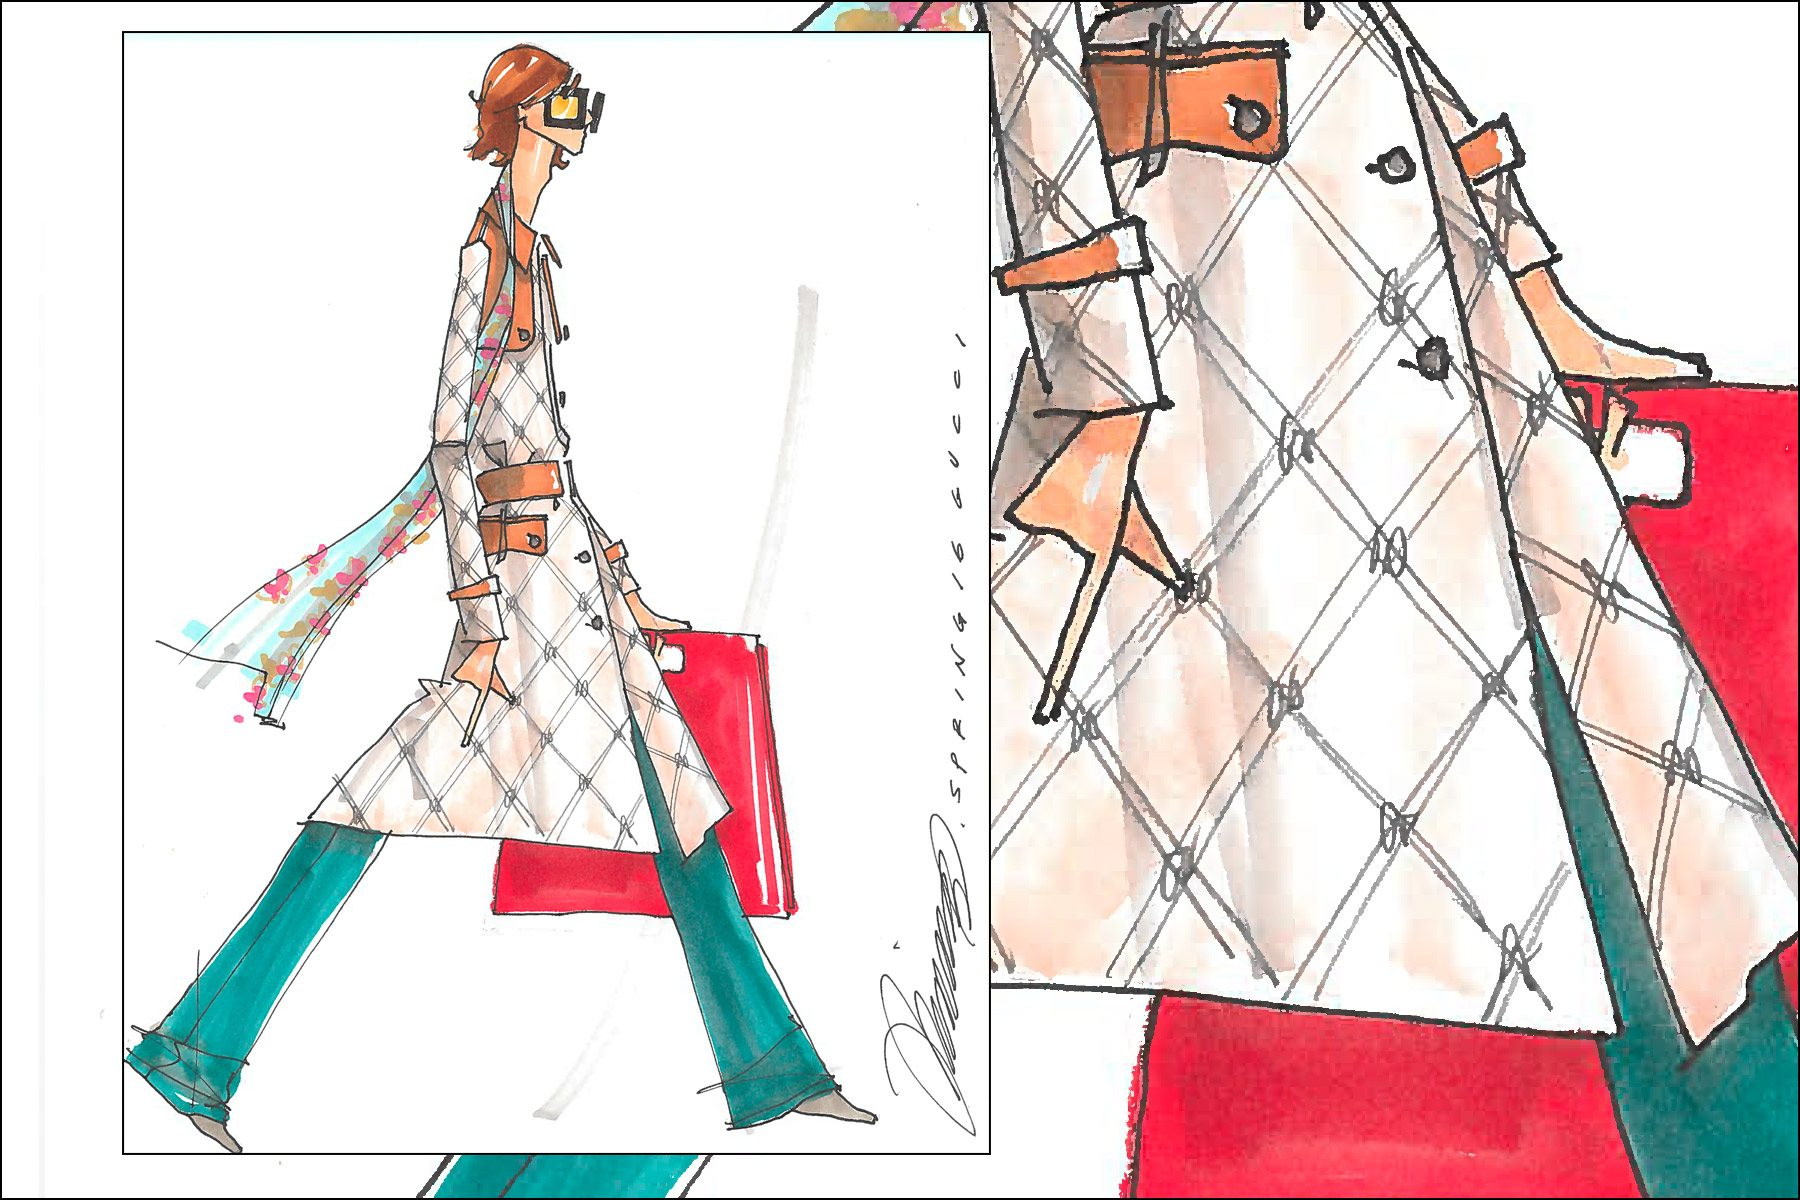 Gucci Spring 2016 men's fashion illustration by Michael Ward. Ponyboy magazine New York.